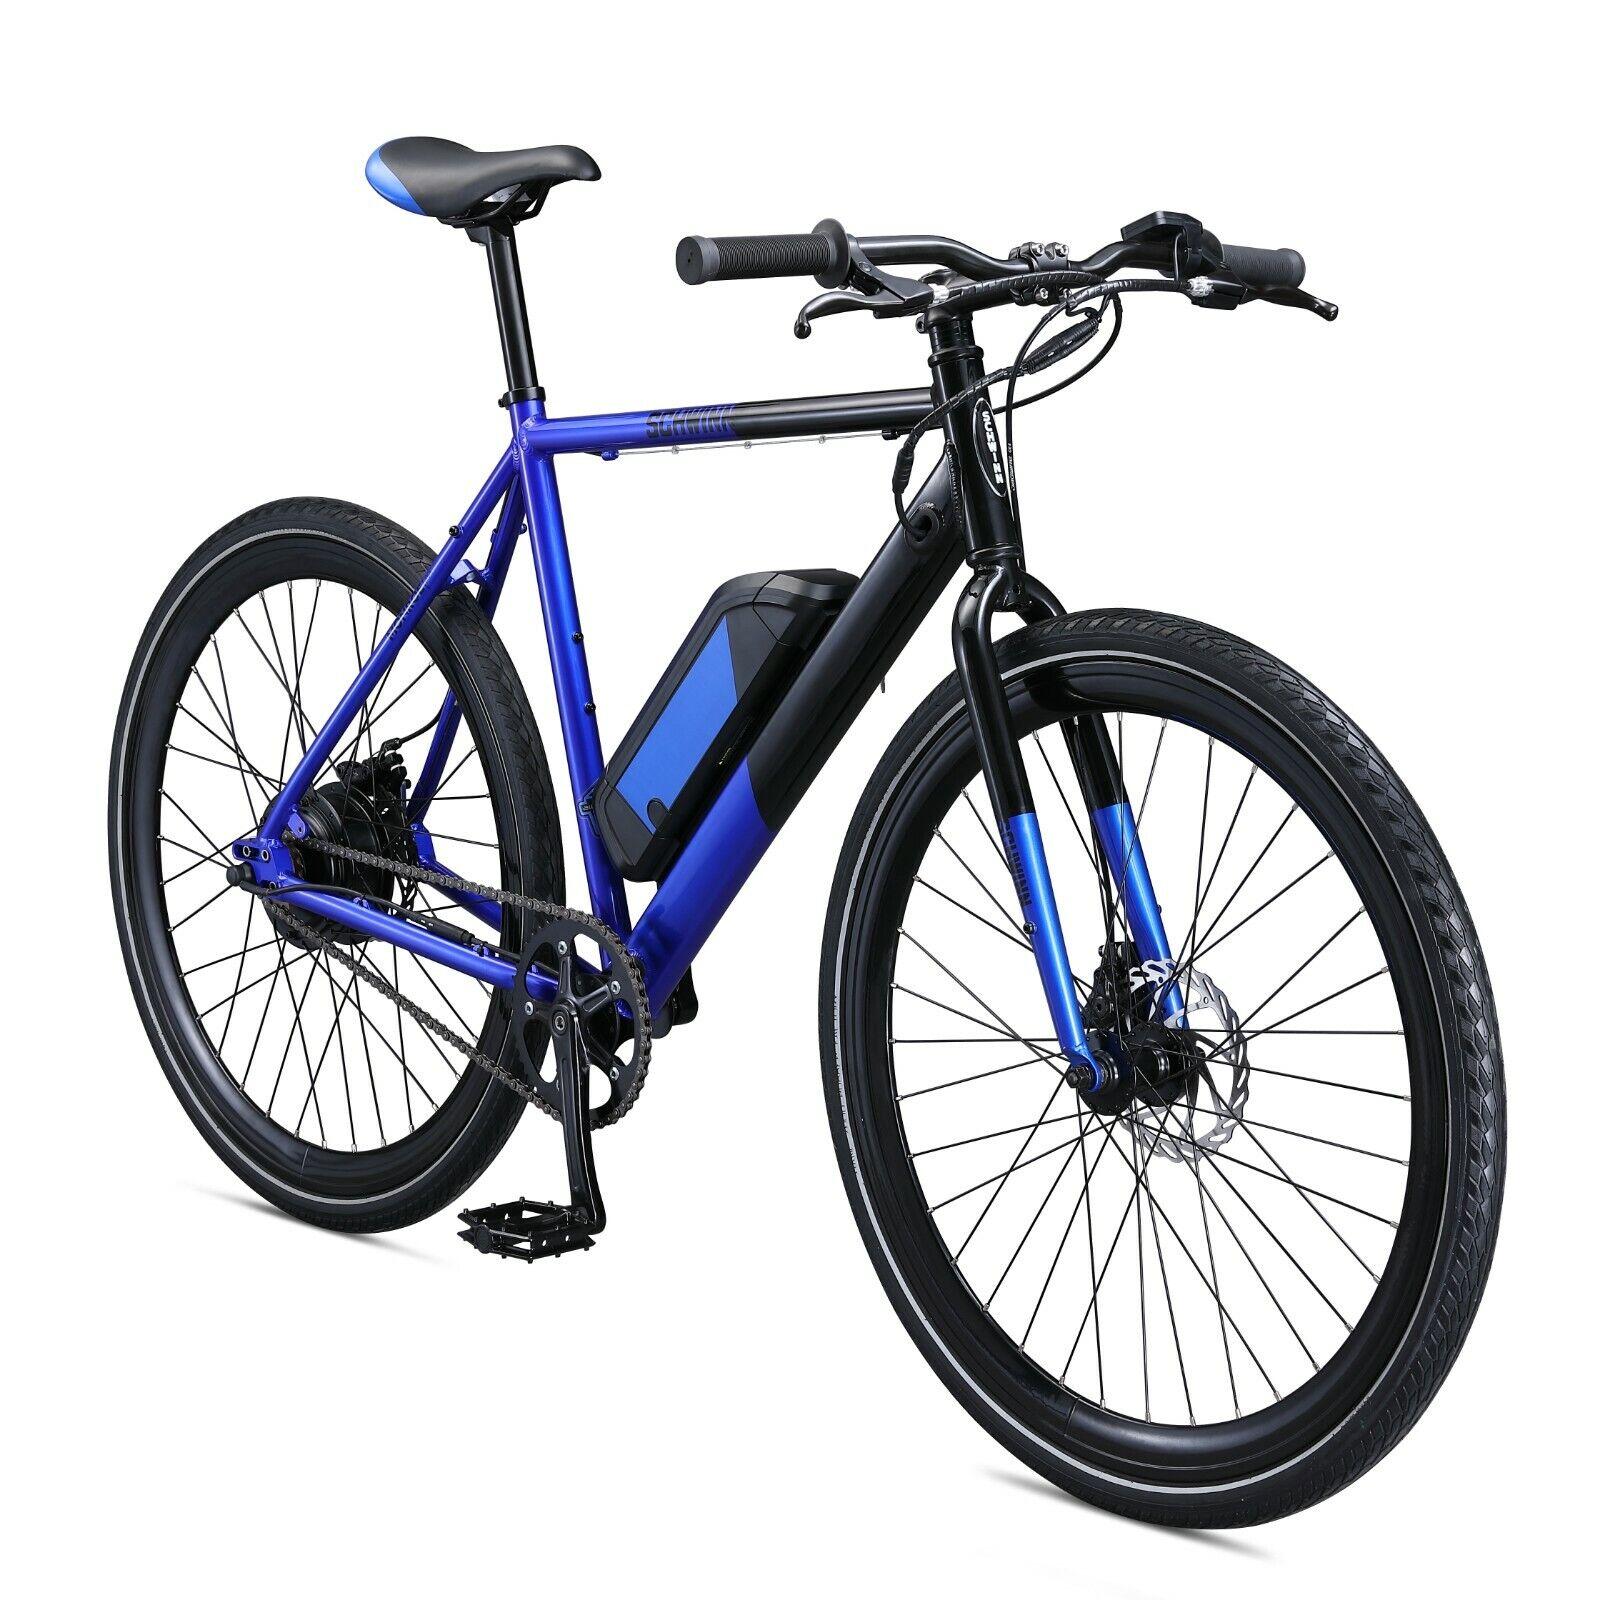 Schwinn 700c Men's Monroe 350 Watt E-Bike Aluminum Frame-Blu